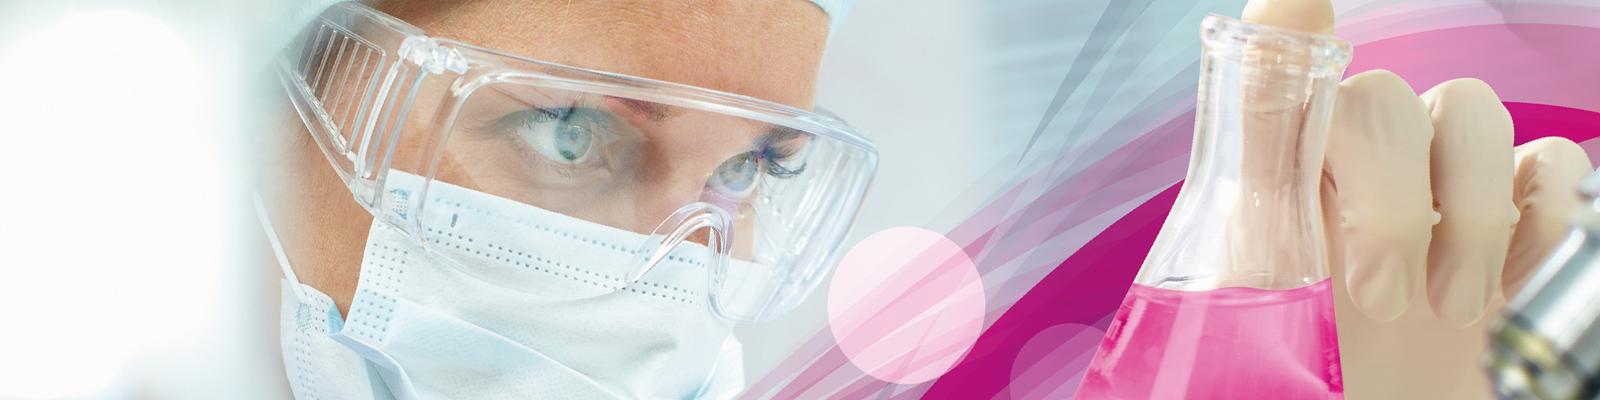 Extensive Pharmacovigilance Experience|Expérience|Amplia Experiencia